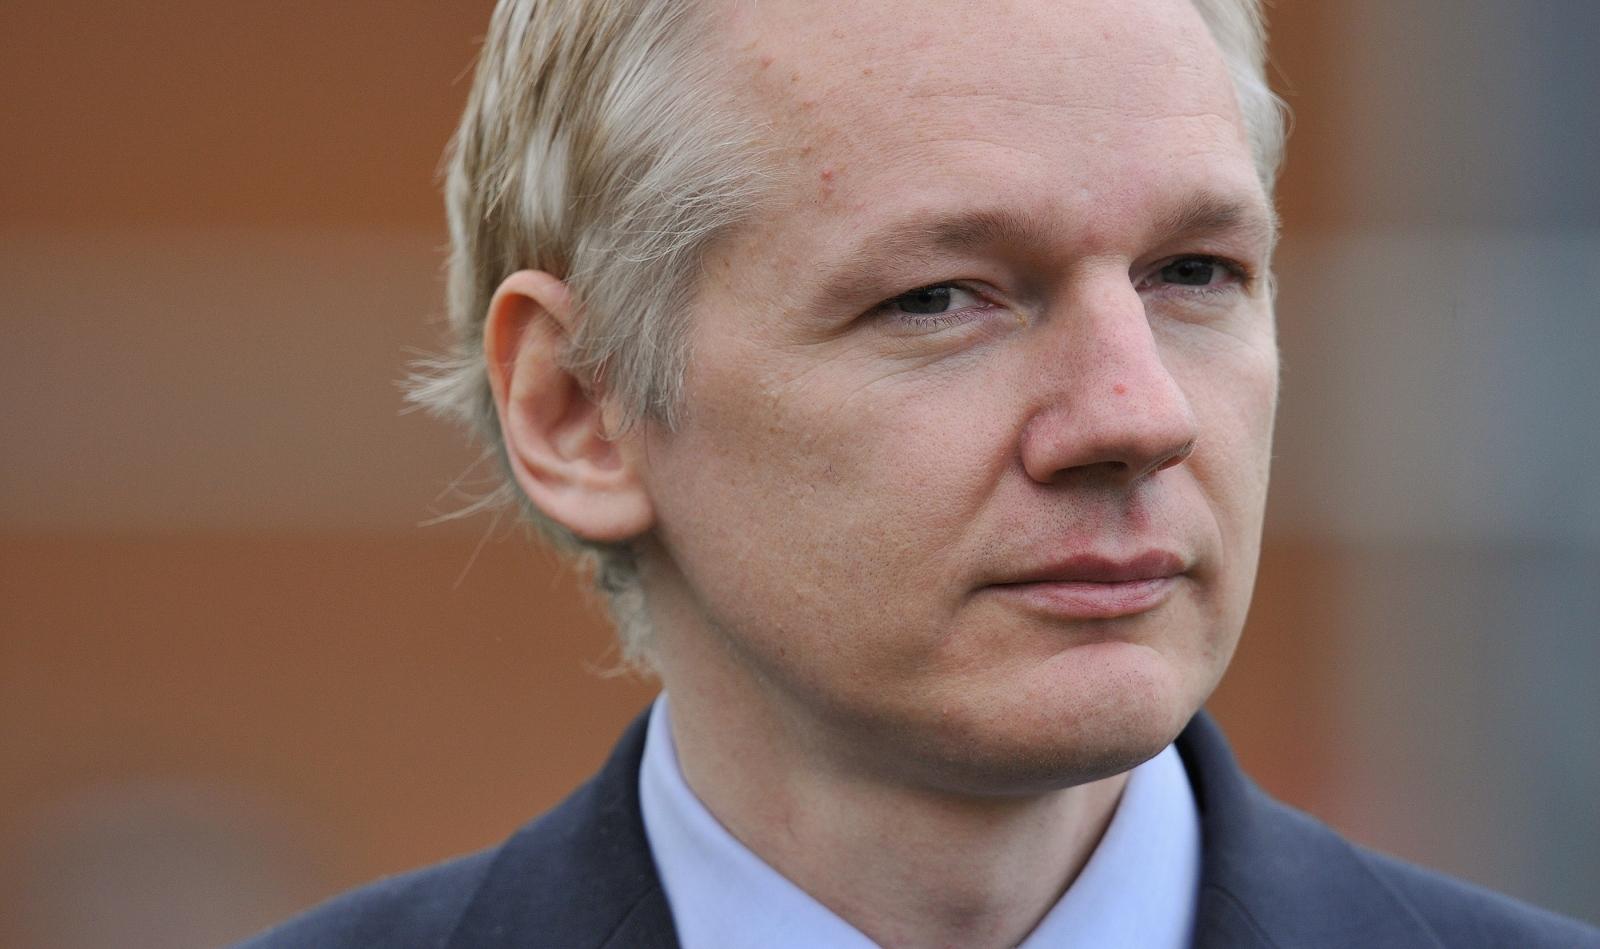 Assange - Obama administration attempting to 'delegitimize' Trump